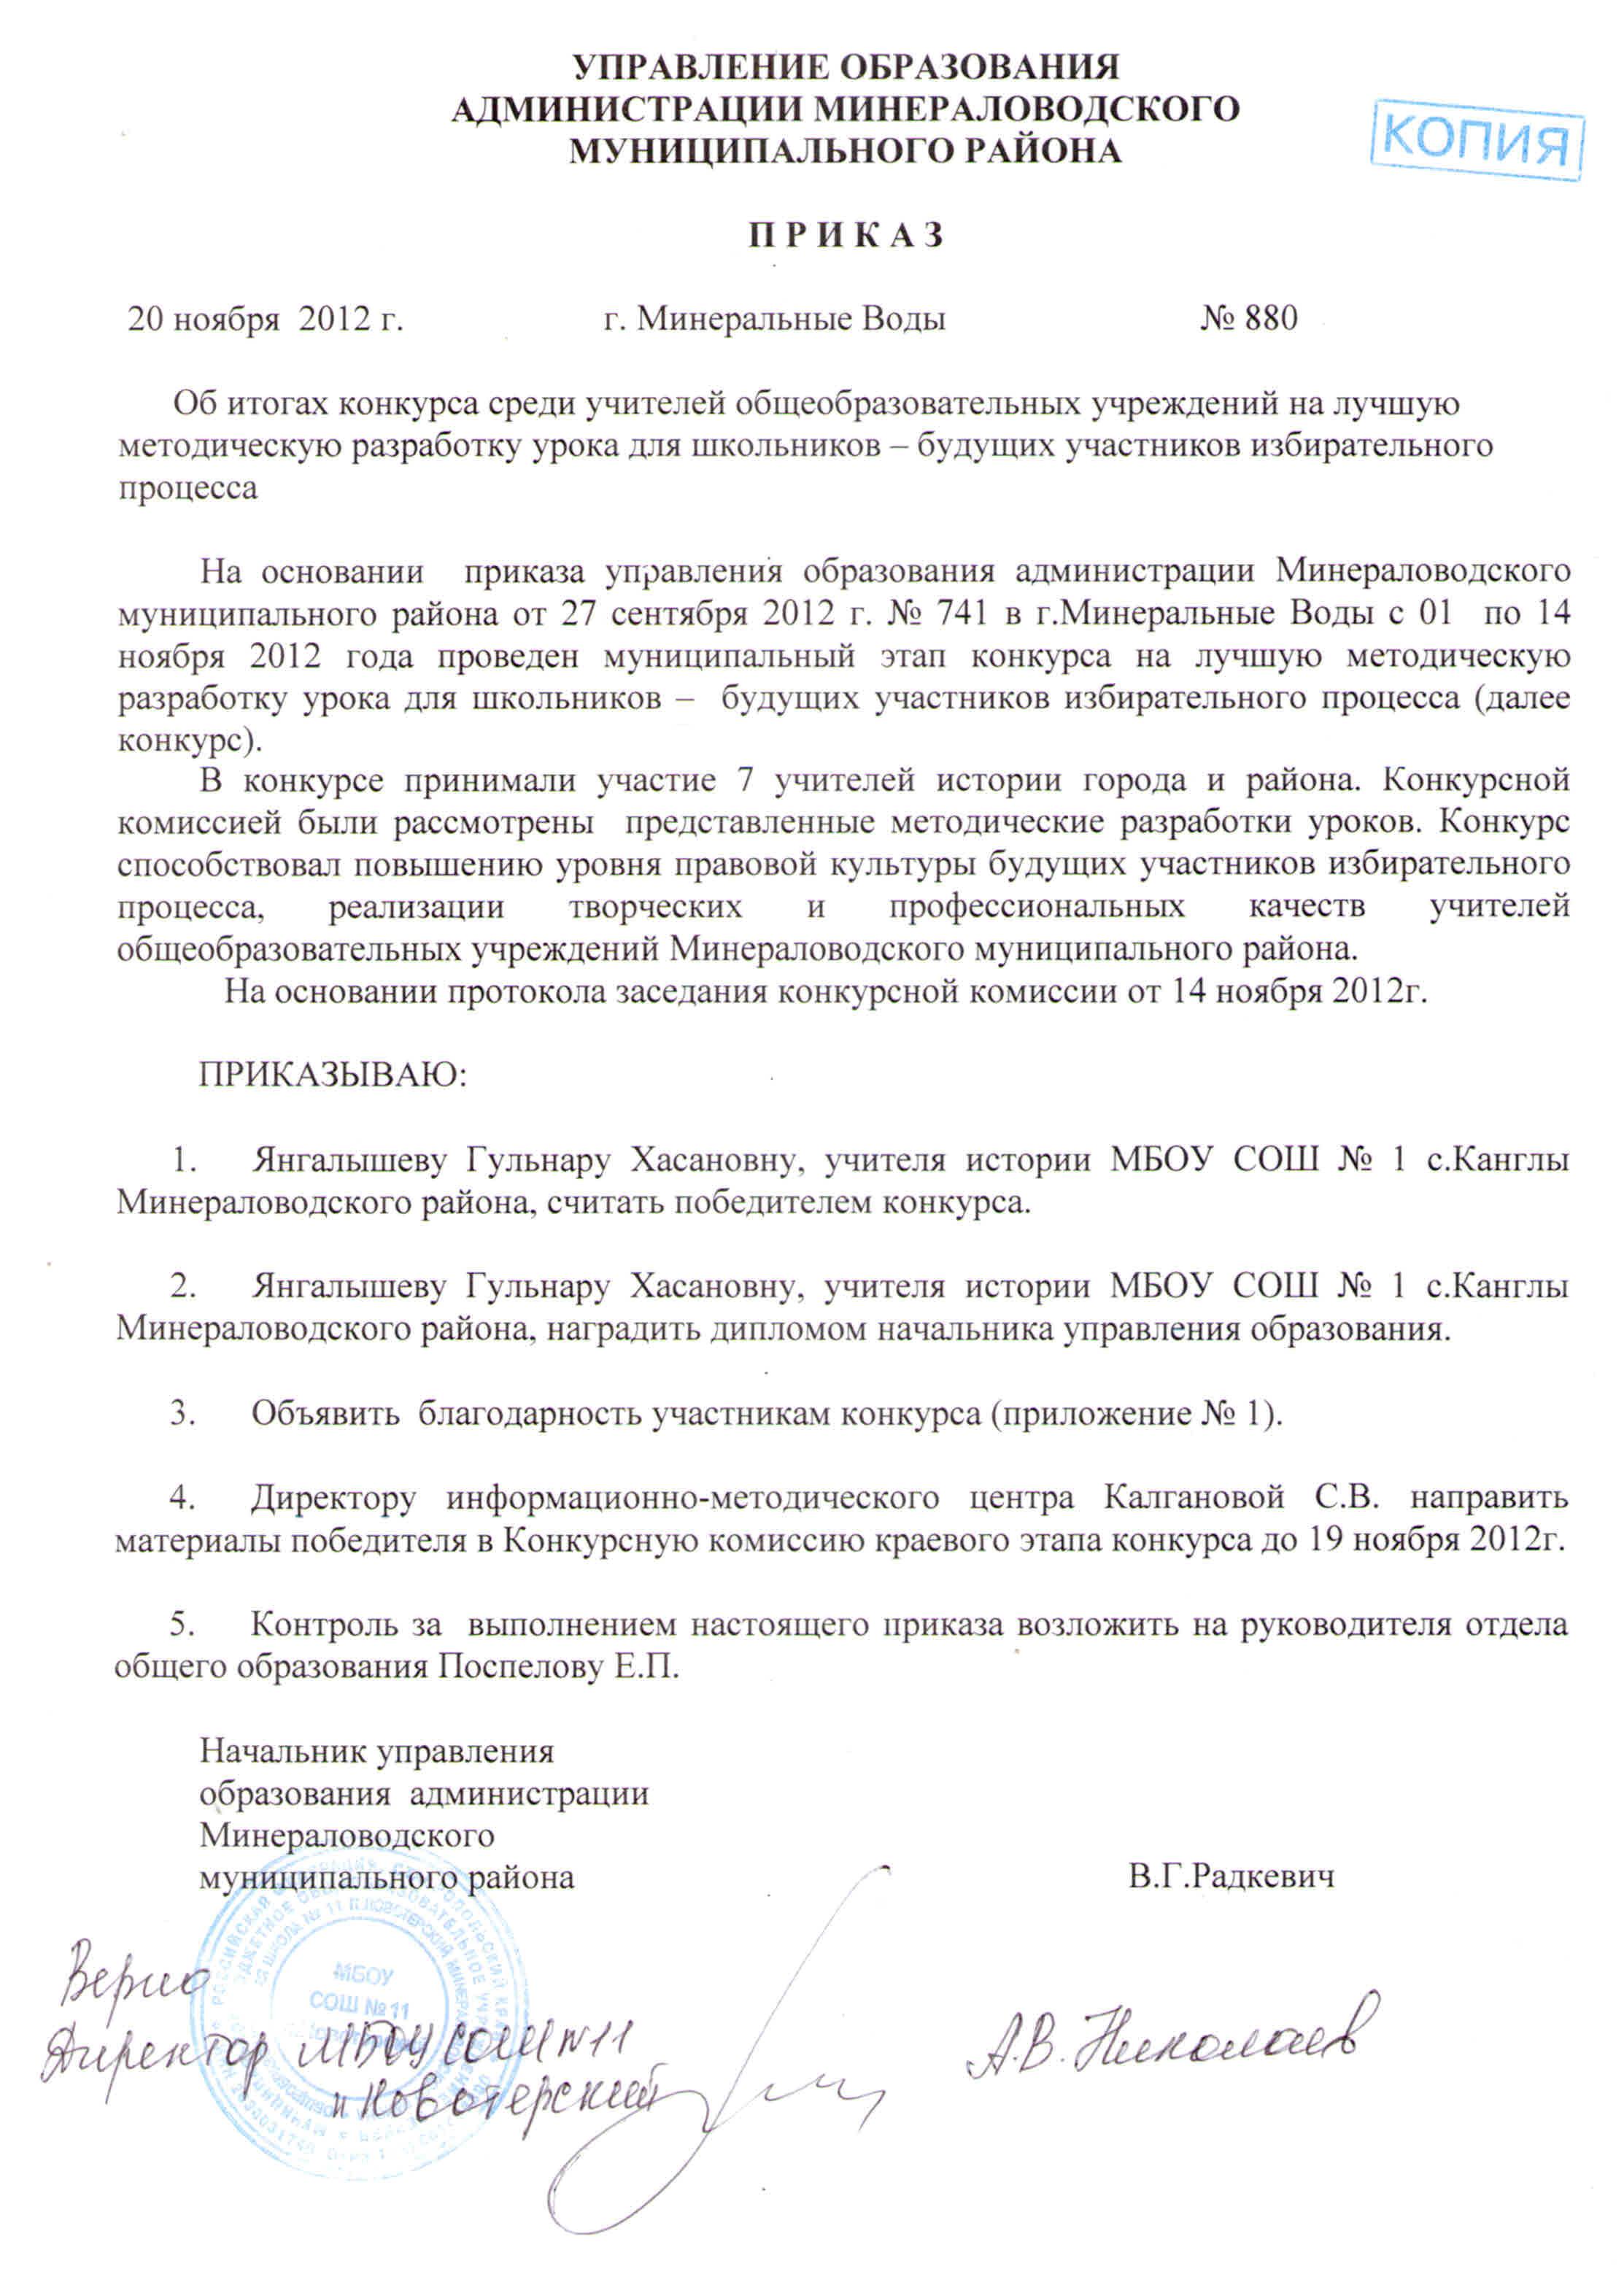 C:\Users\Сергей\Desktop\док-ты\Document_4.jpg